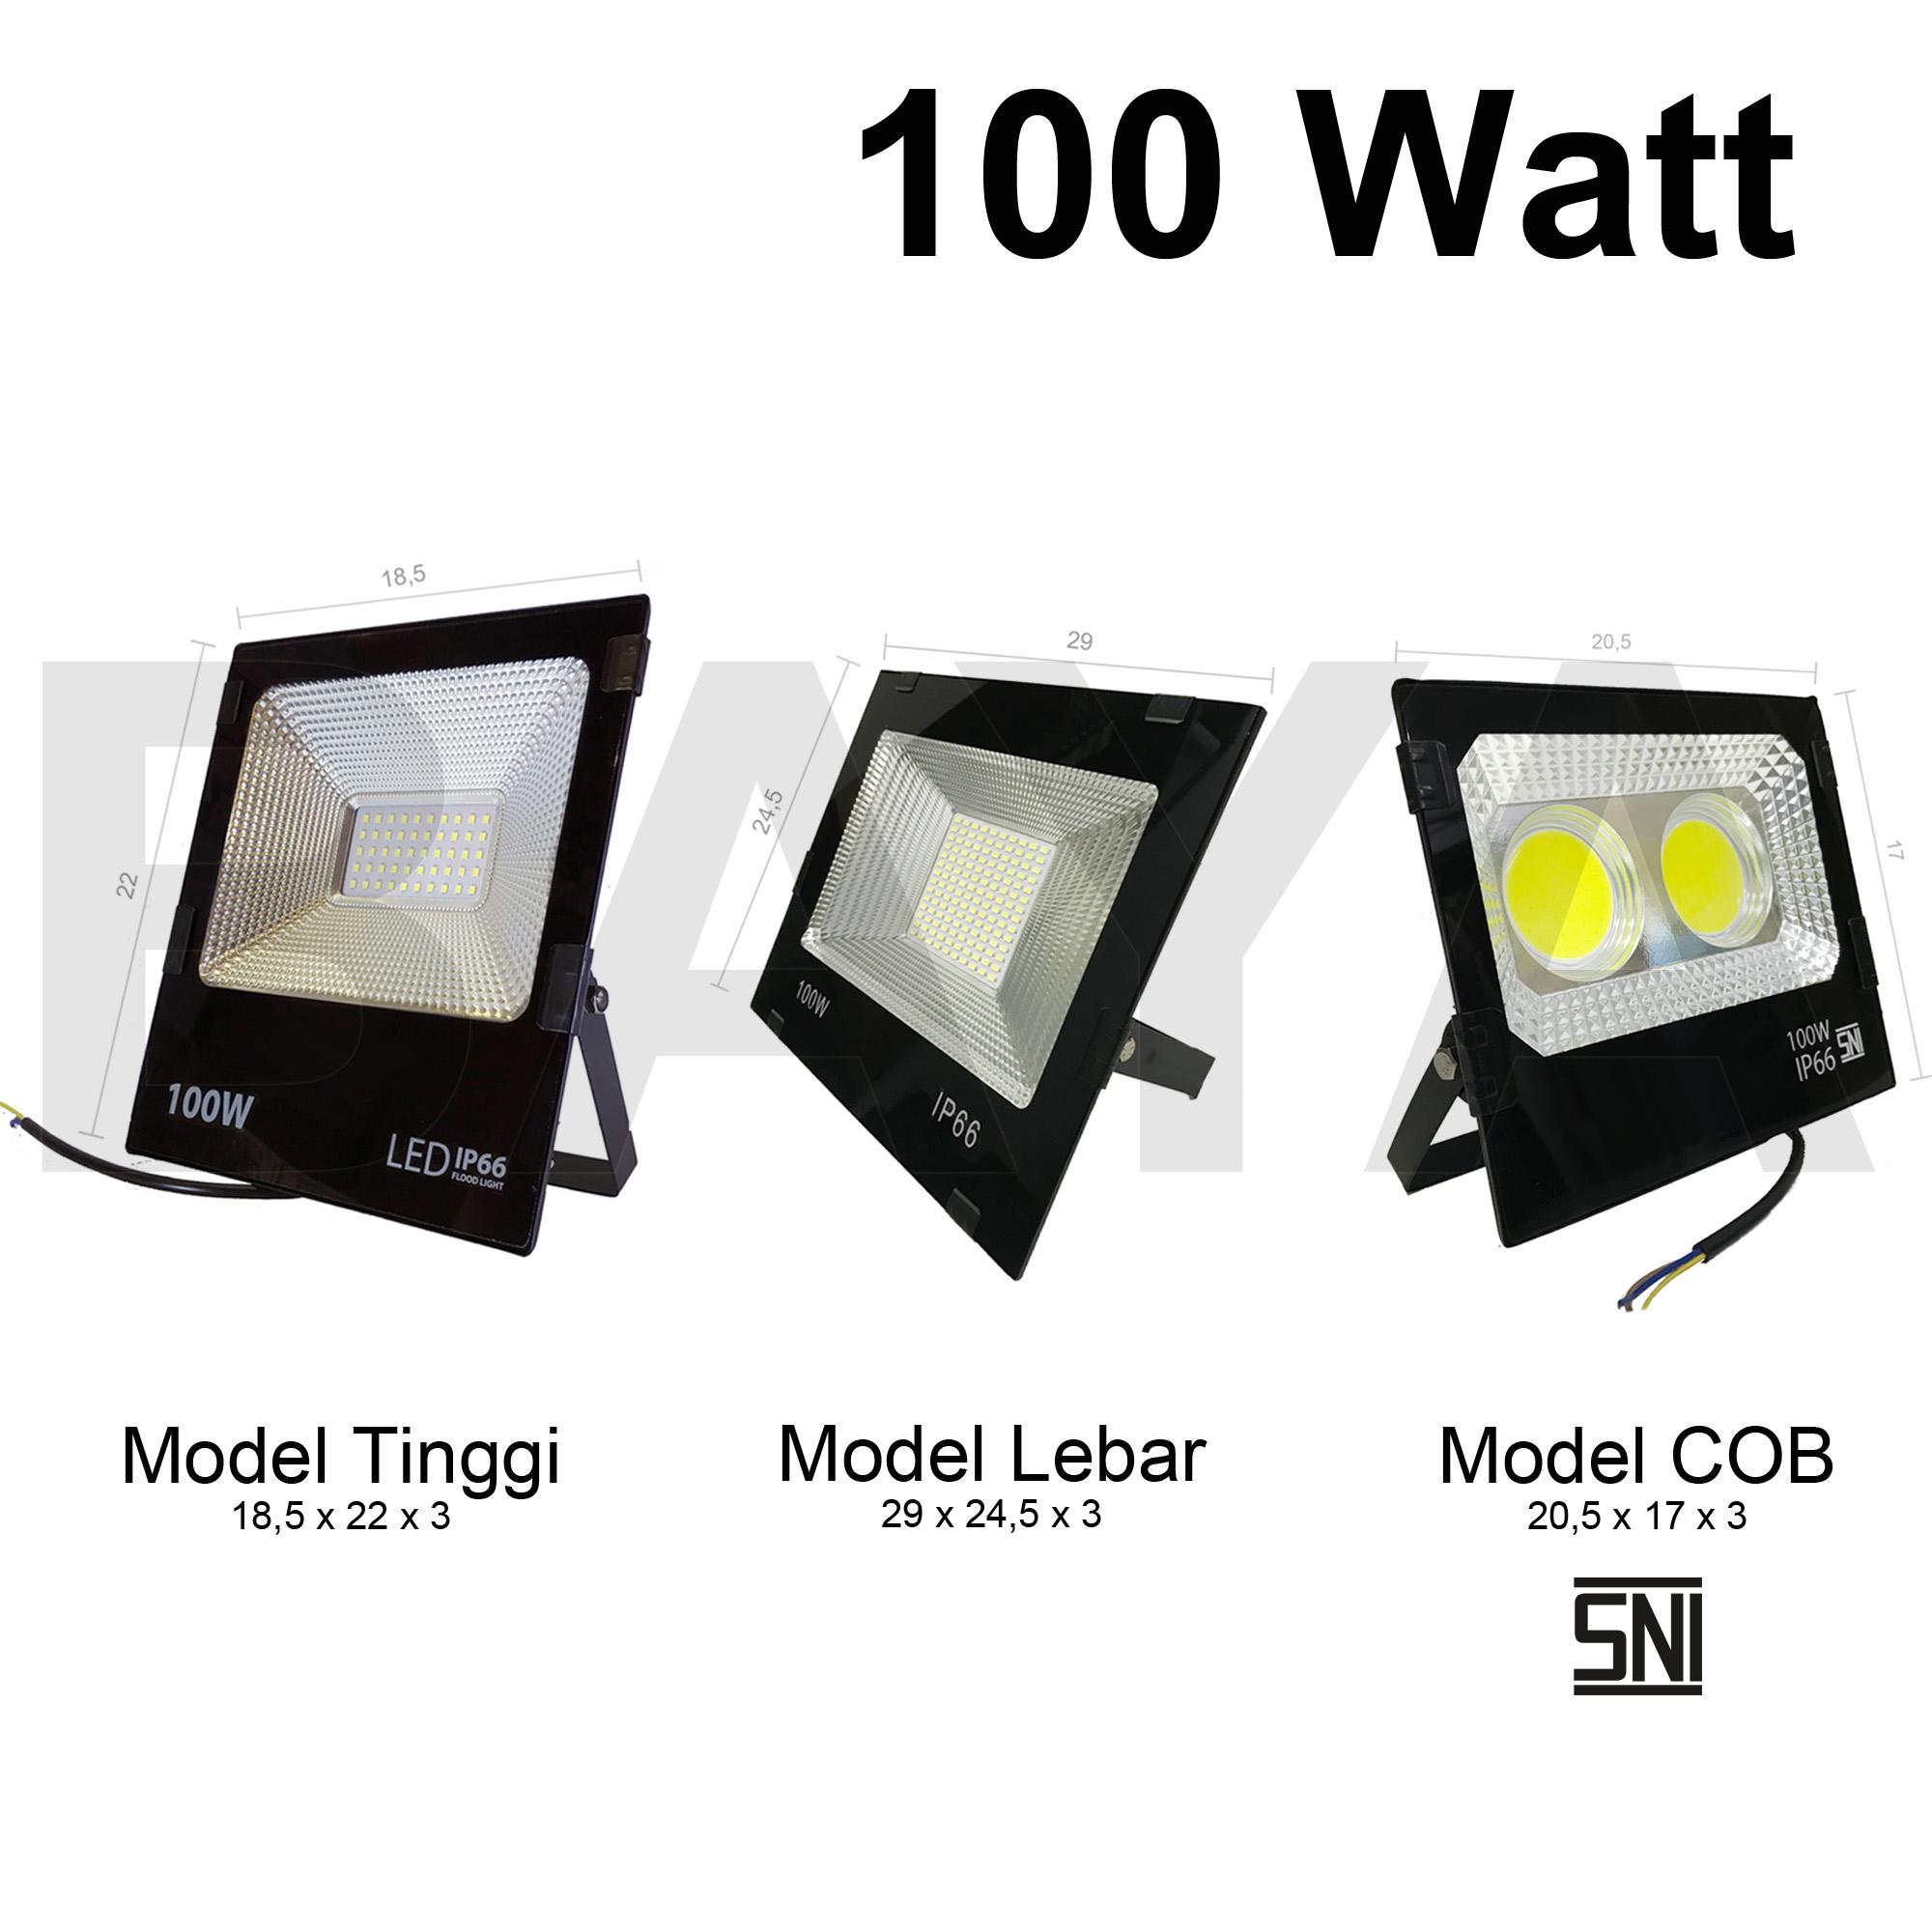 lampu led sorot / tembak / floodlight / outdoor 100W 100 watt reflector